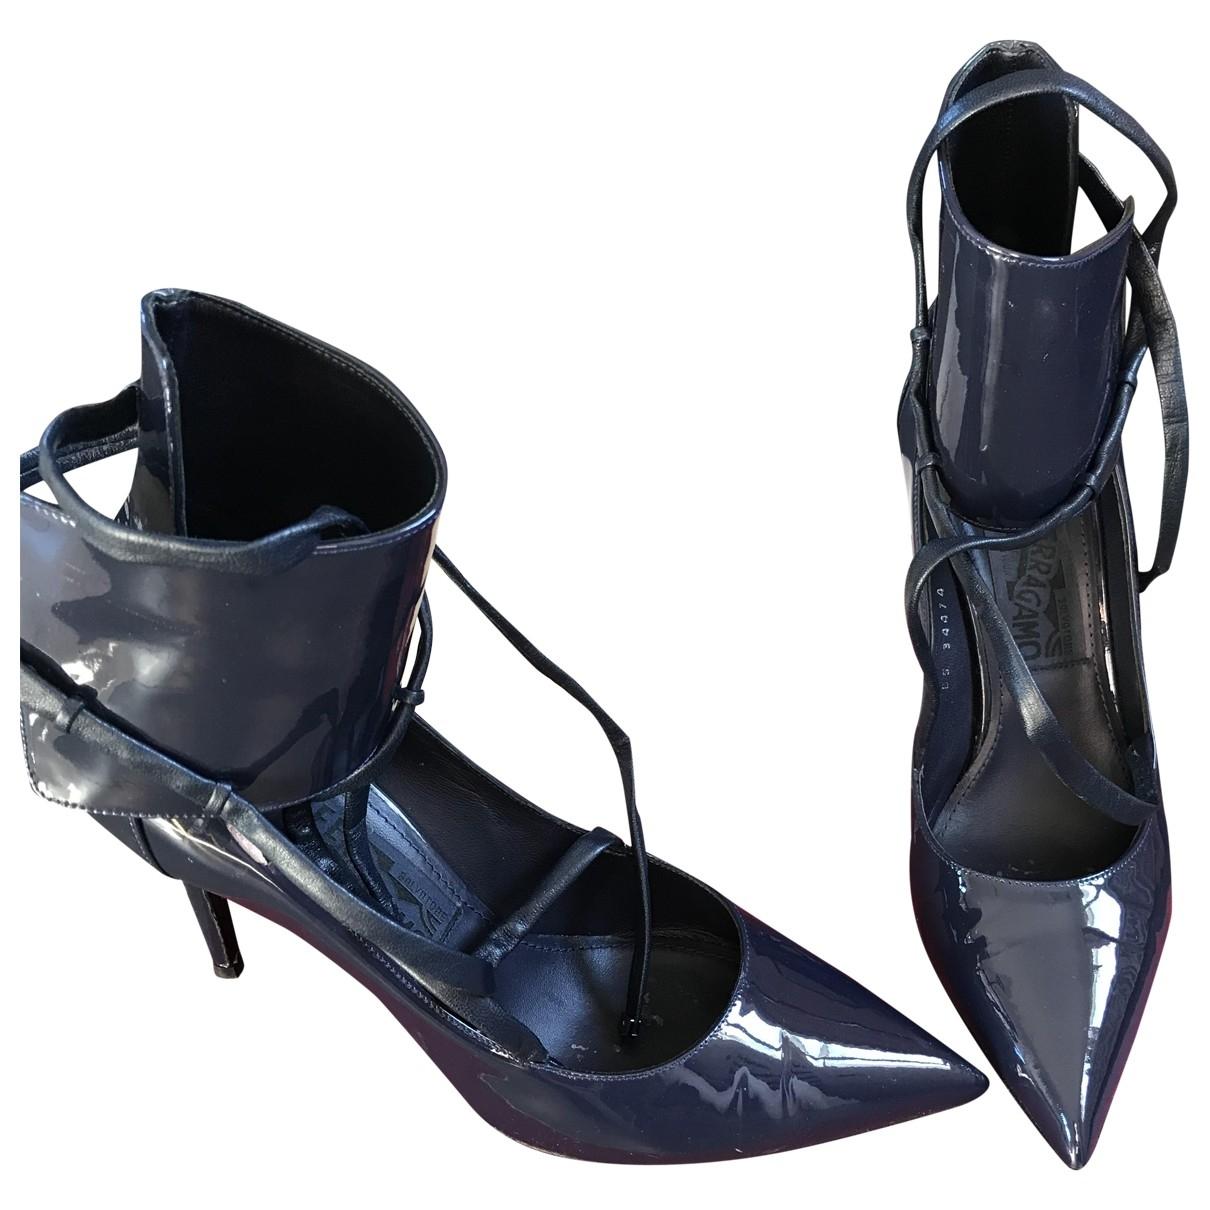 Salvatore Ferragamo - Escarpins   pour femme en cuir - bleu